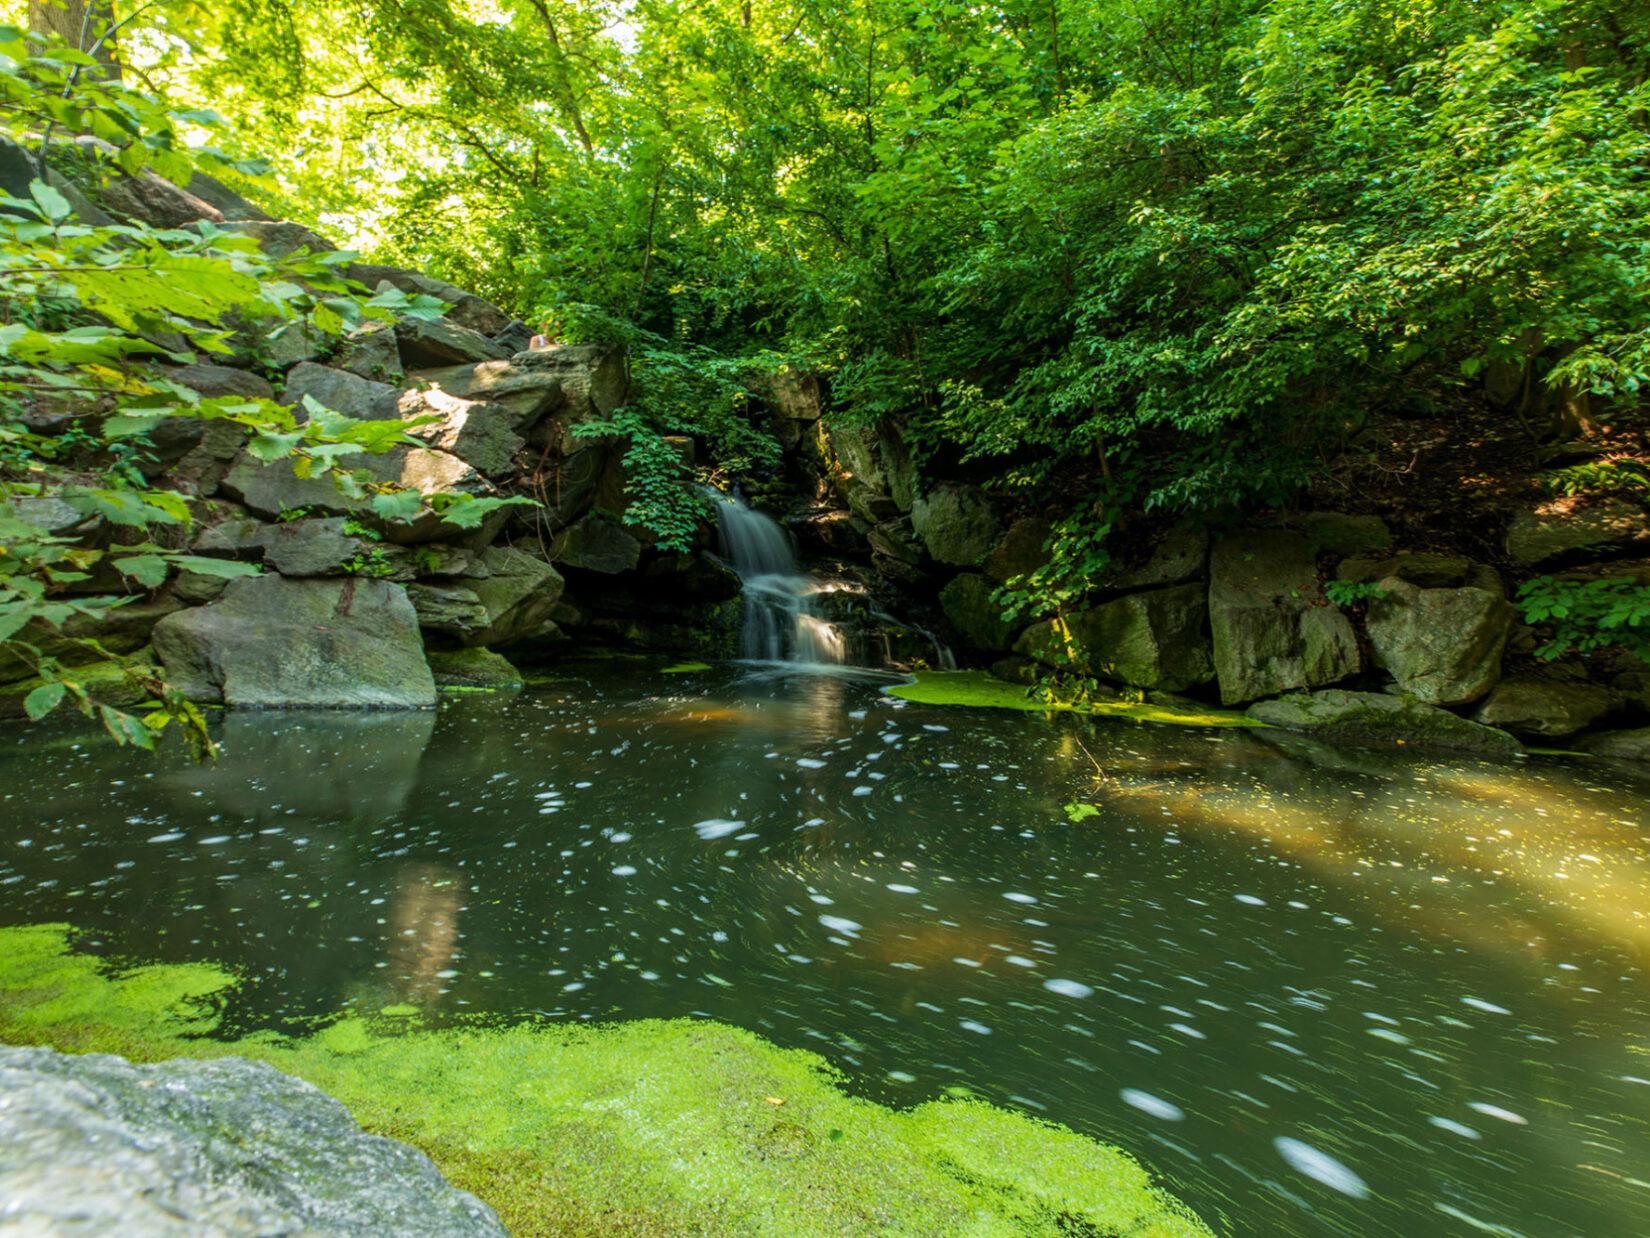 A small waterfall in the Ramble